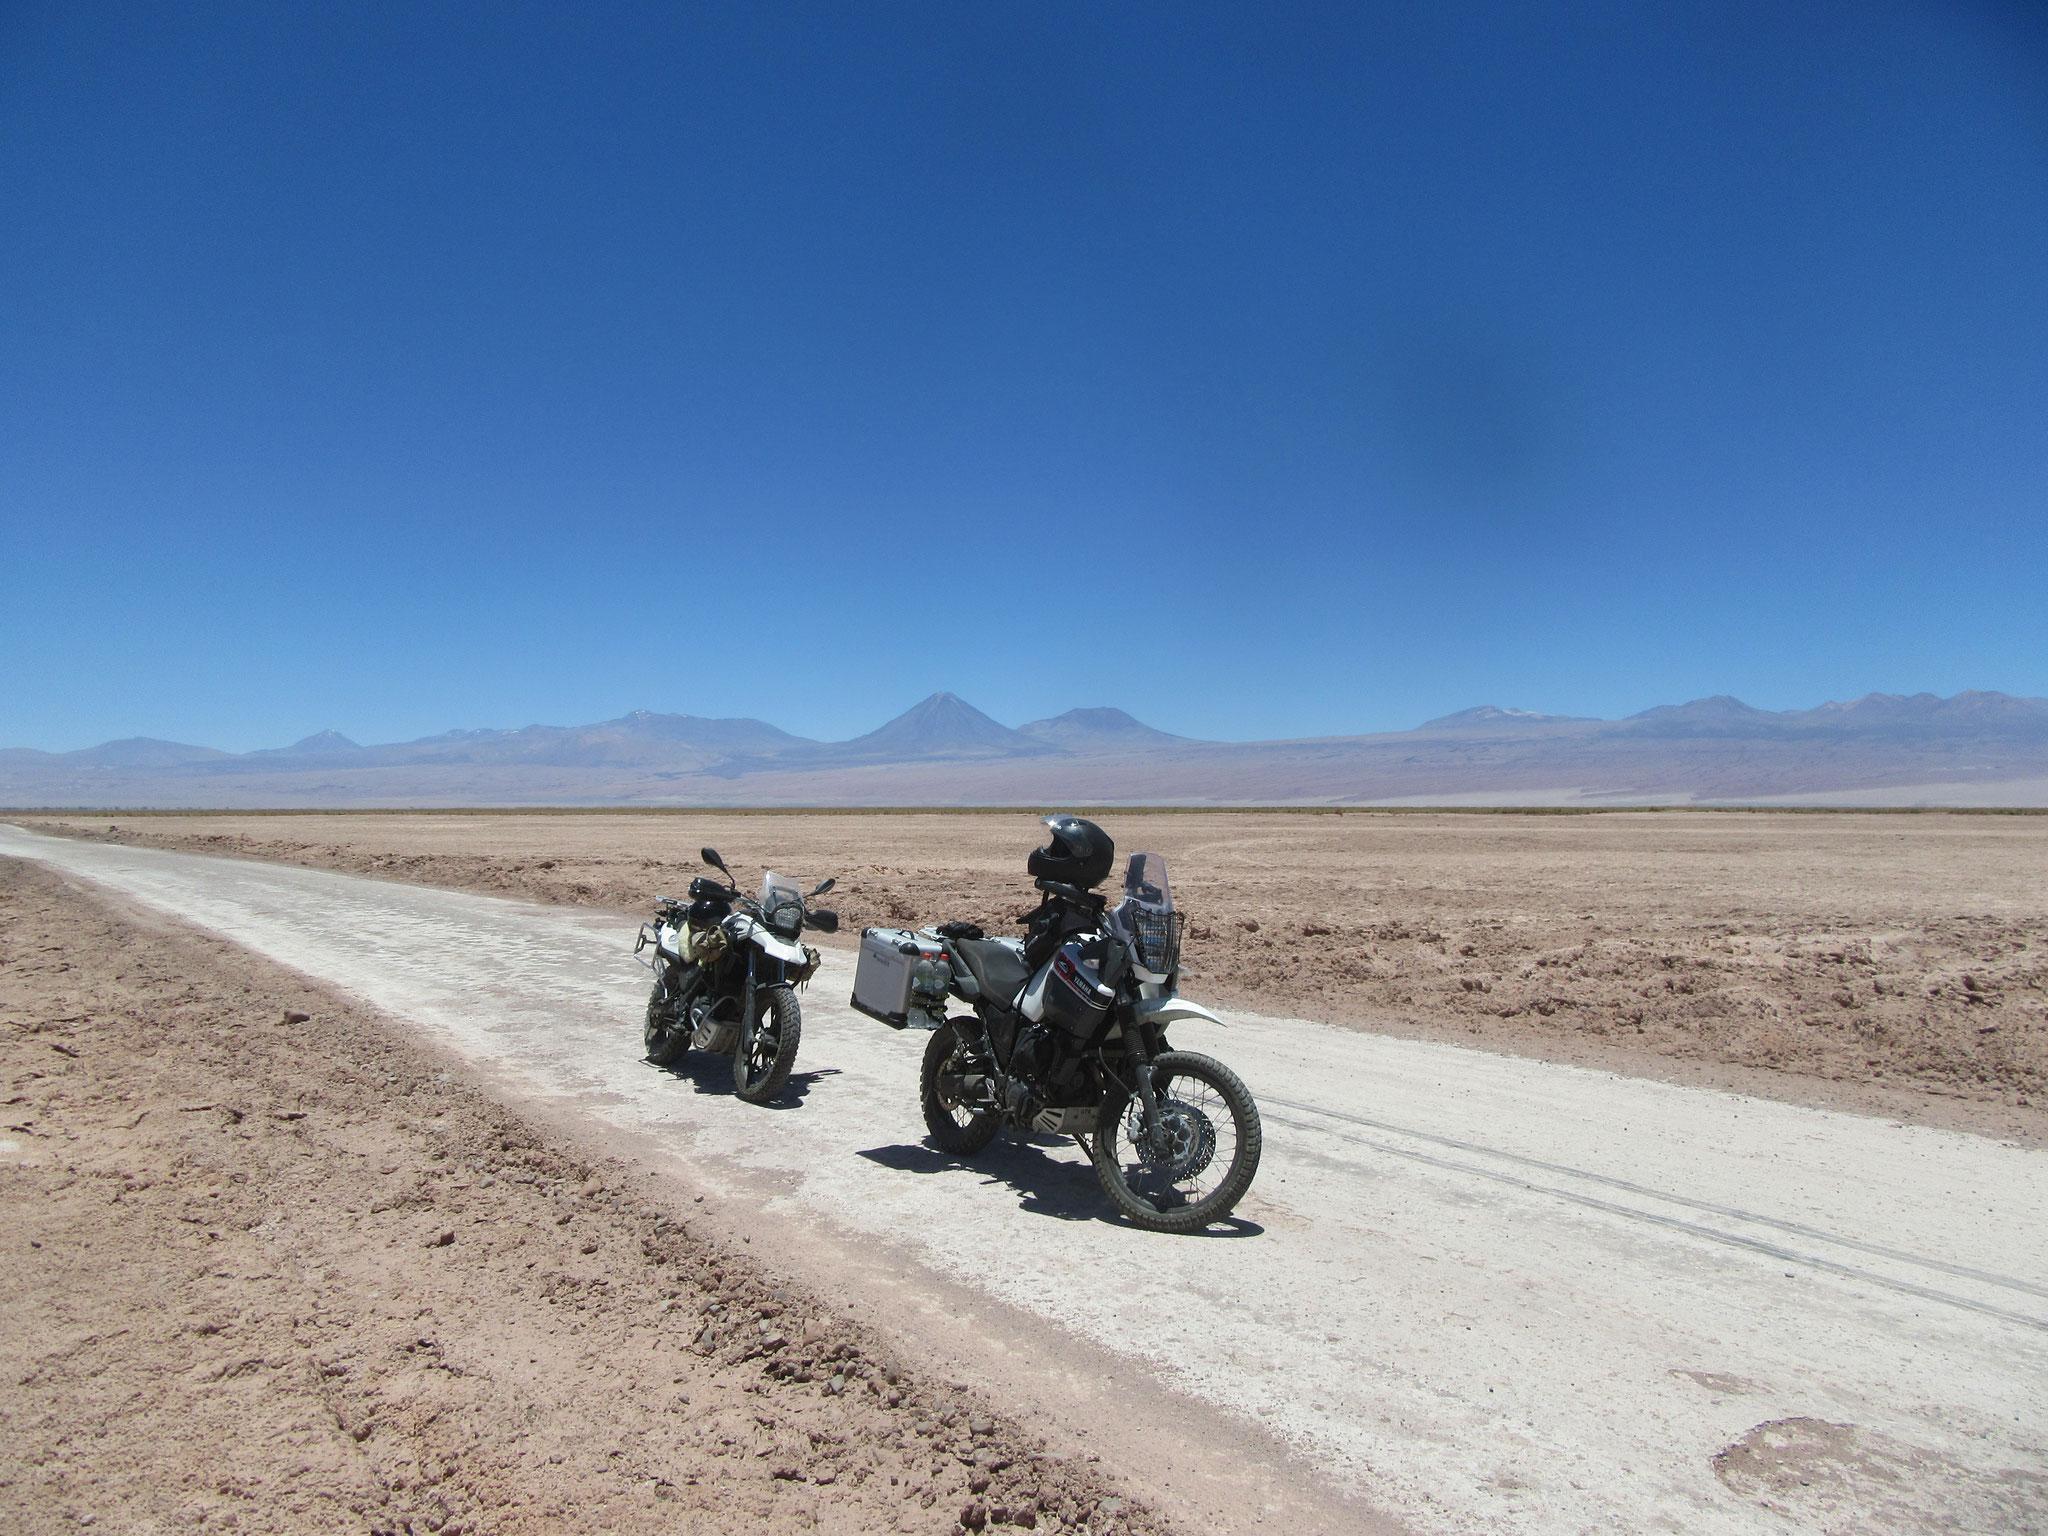 Driving through Atacama Desert